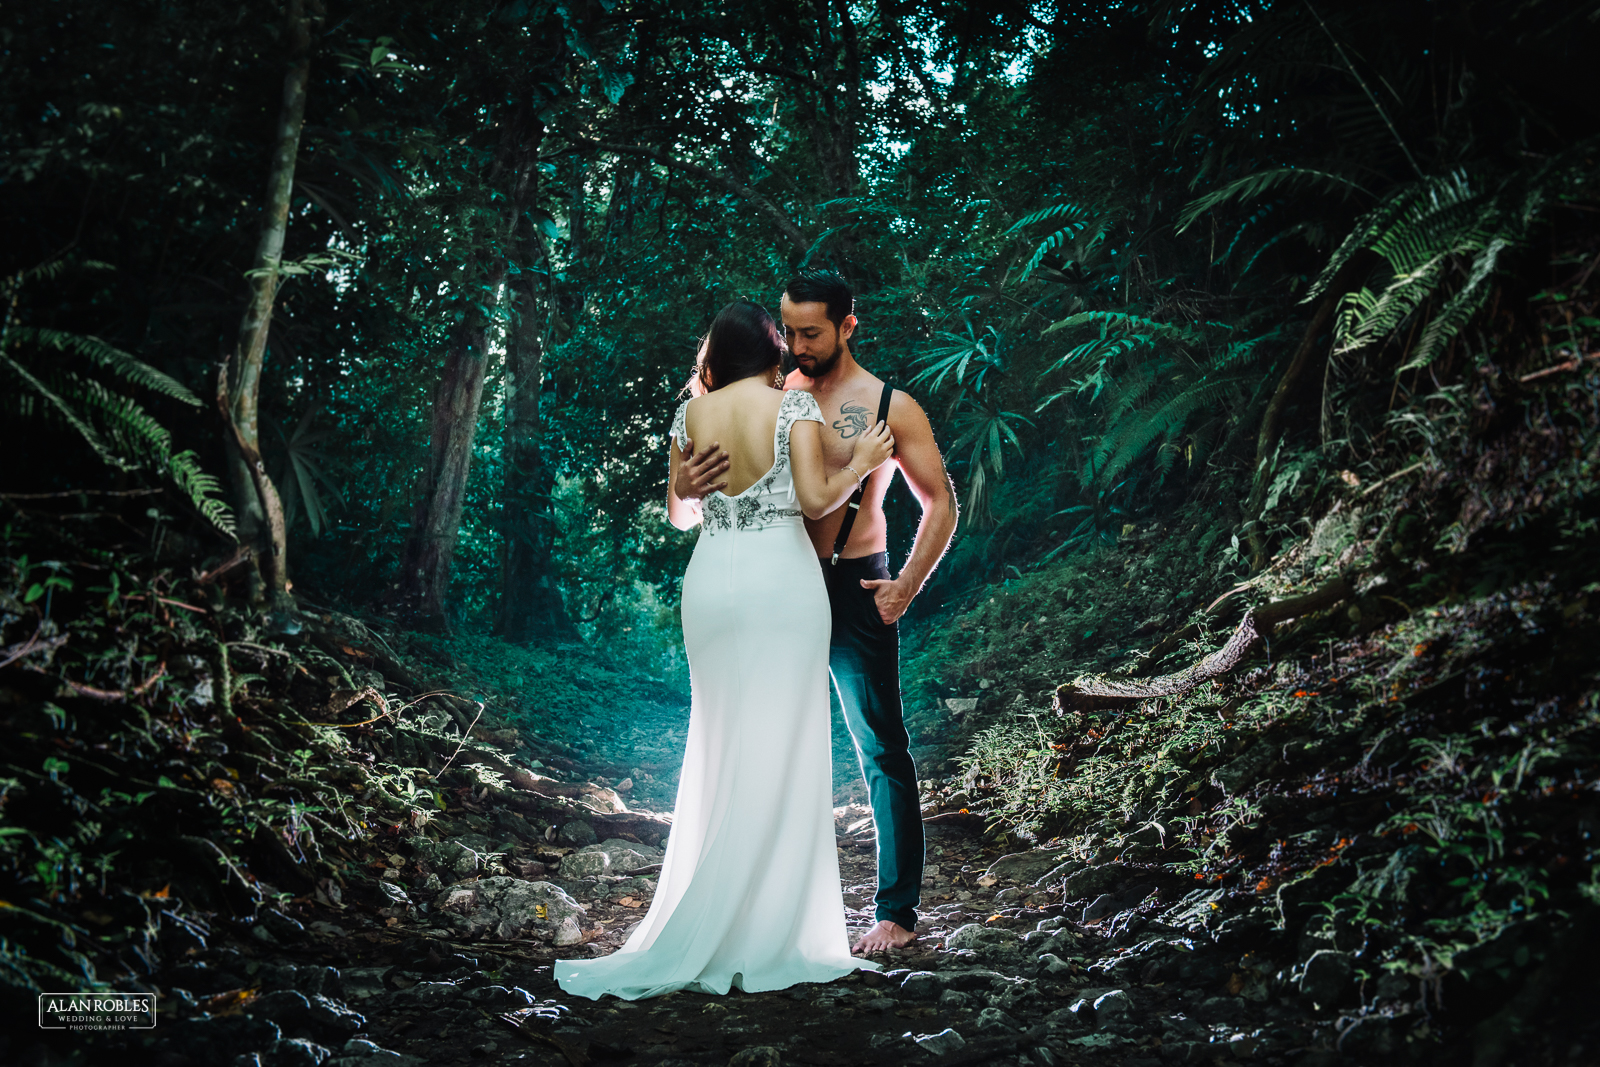 Fotografo de bodas Alan Robles-Pre boda Chiapas-33